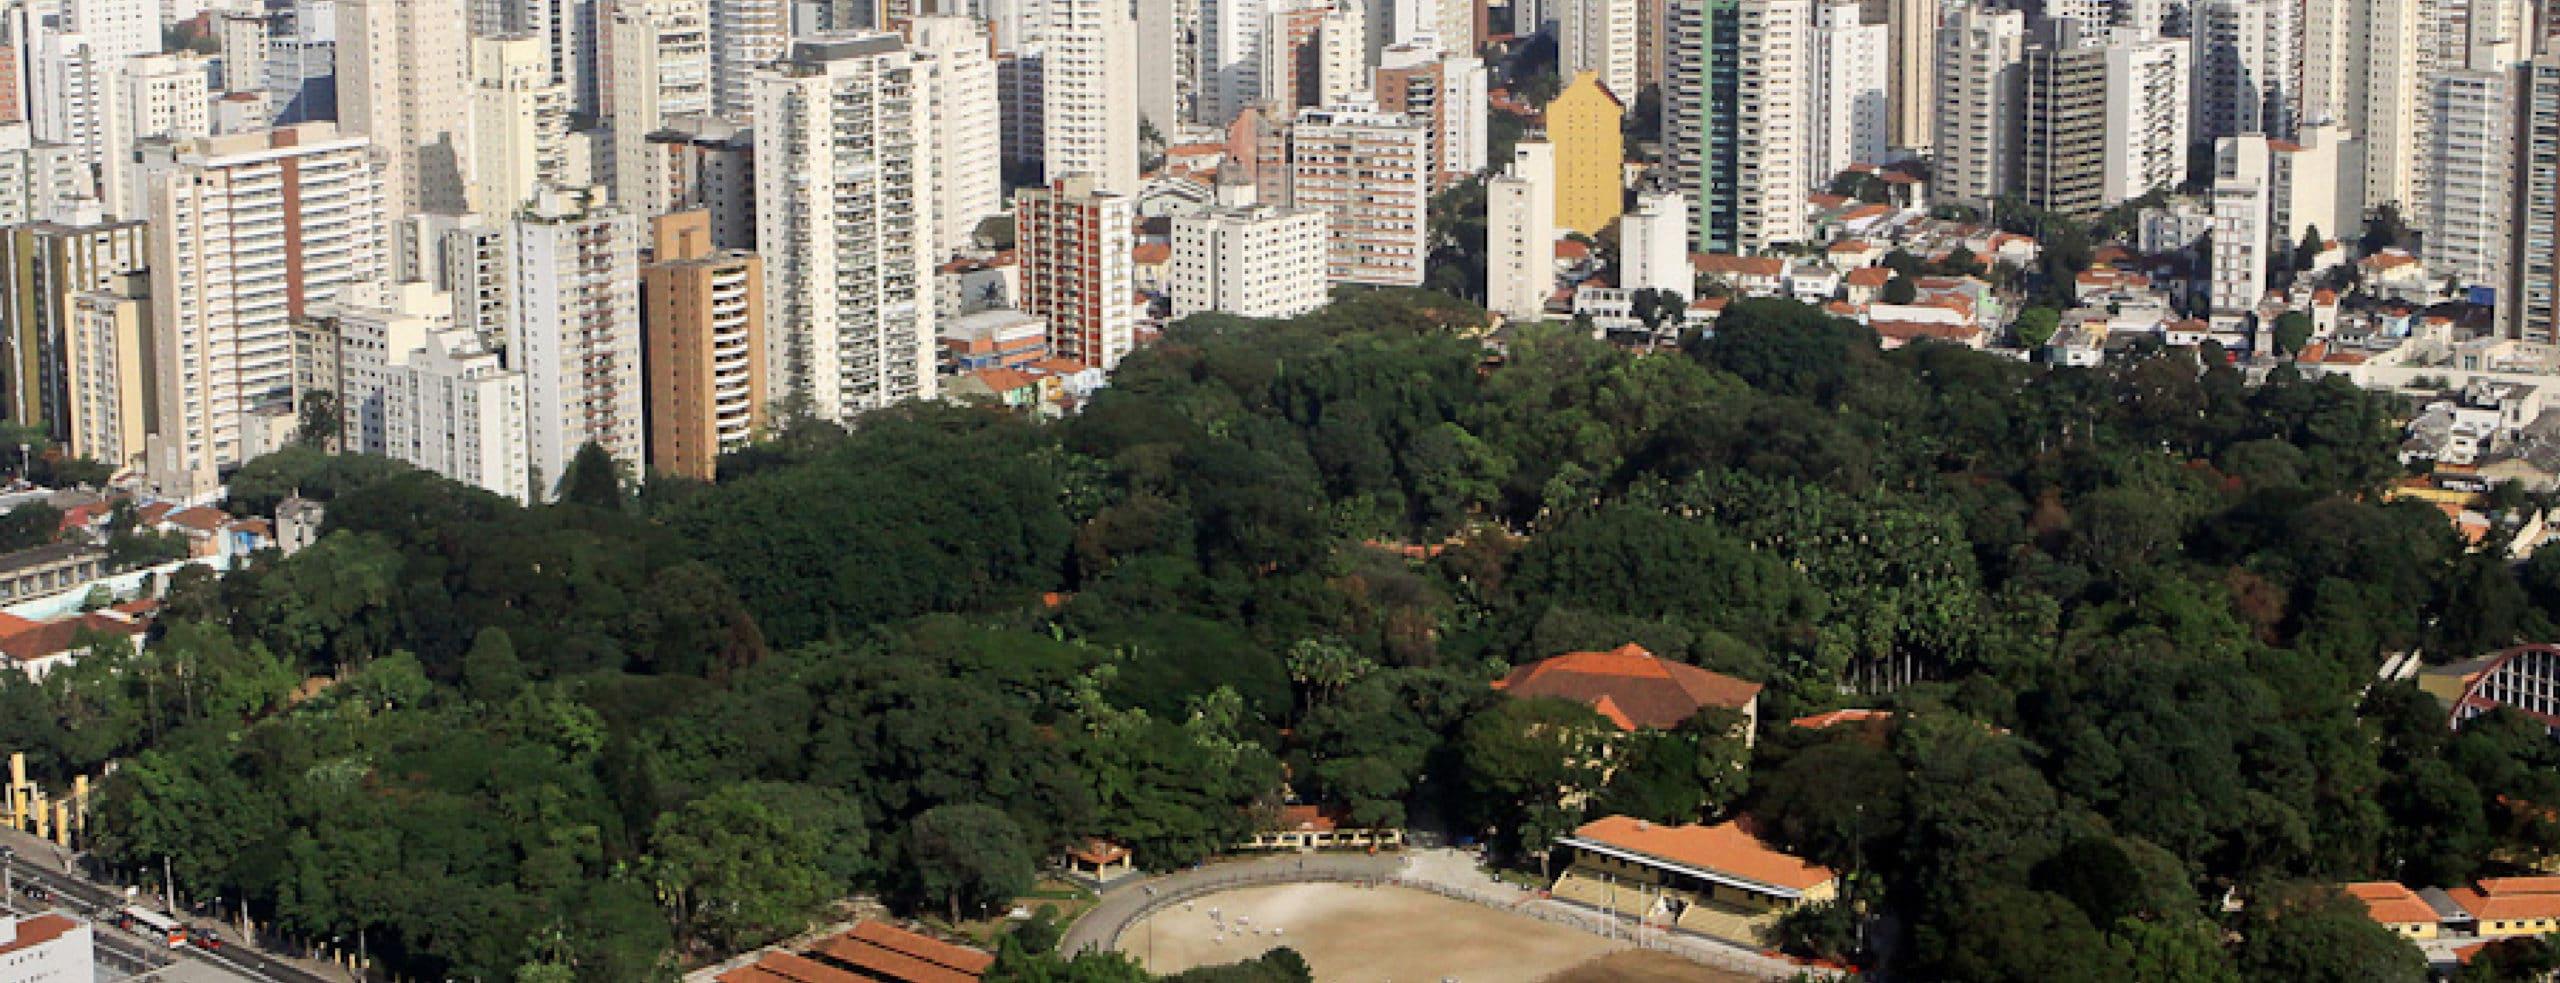 Parque Agua Branca, Sao Paulo RipioTurismo DMC for Brazil